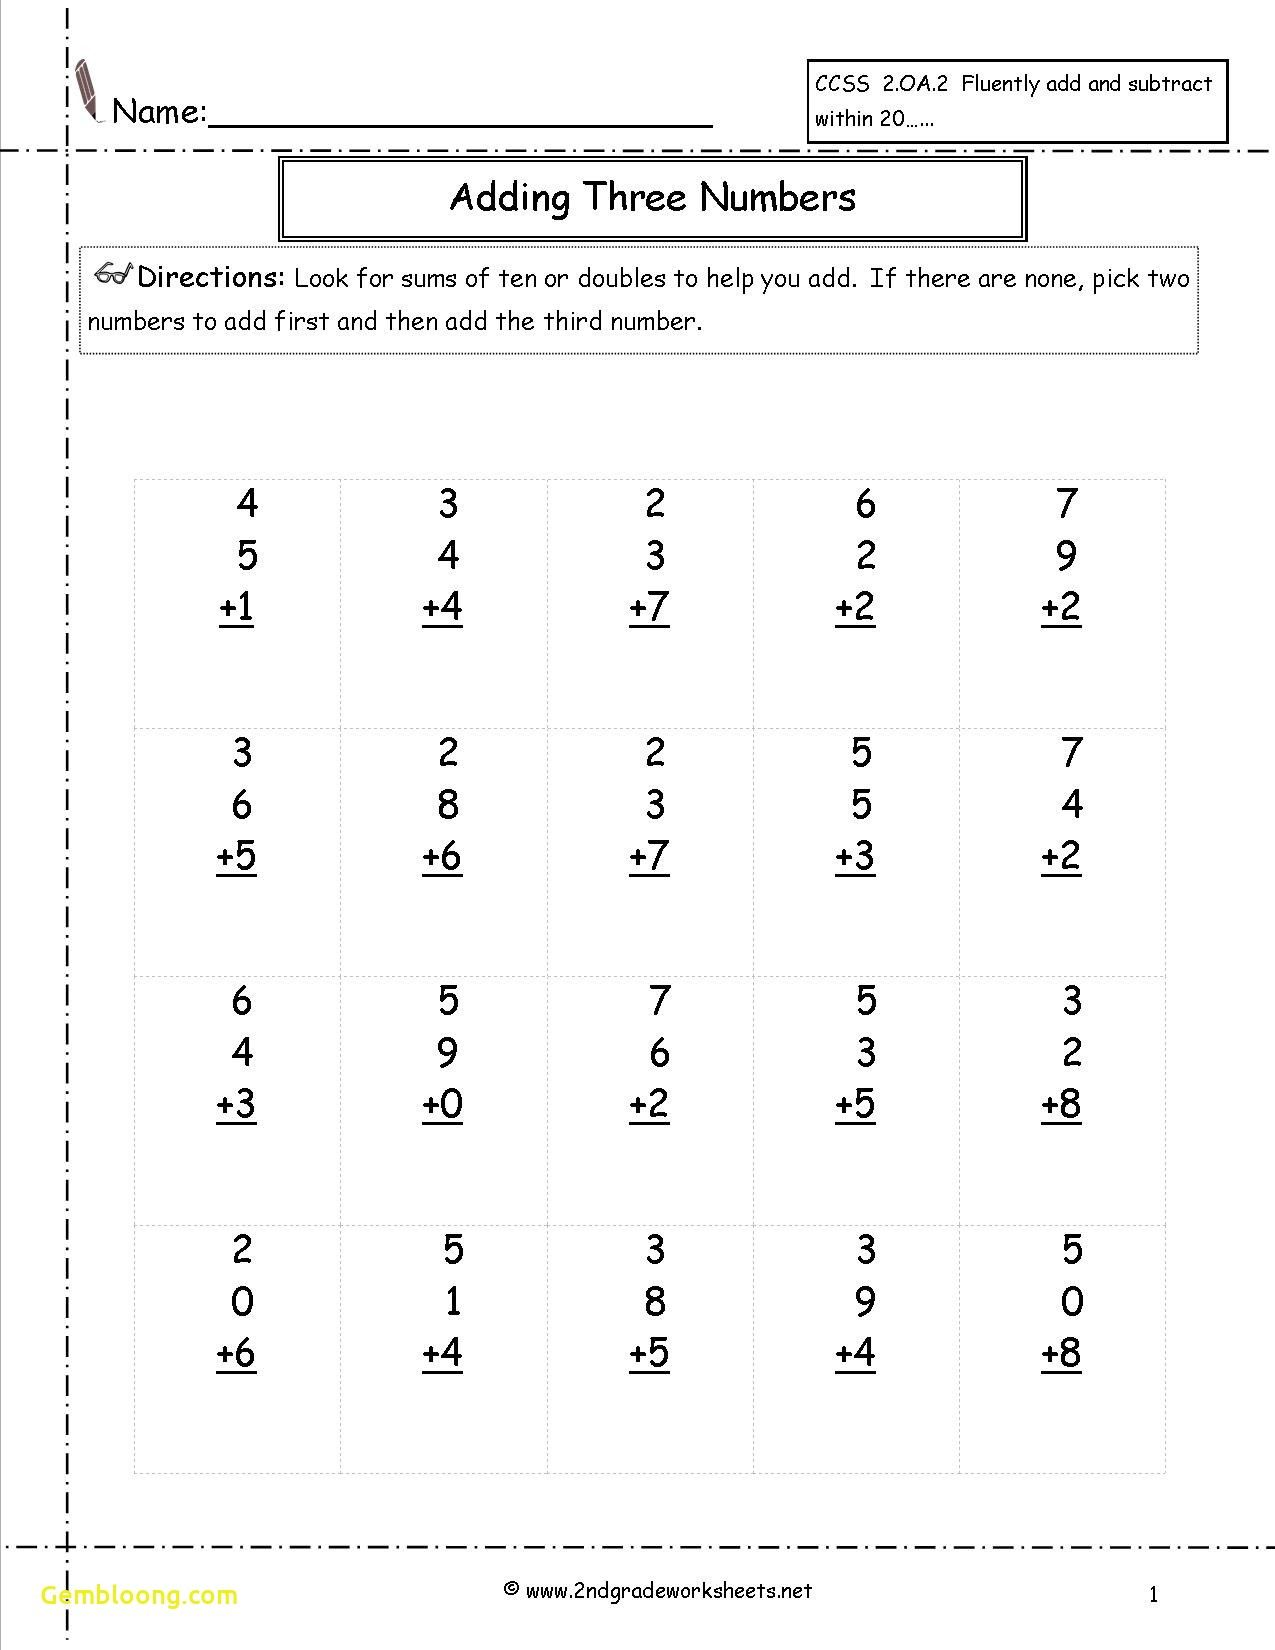 Inspirational Math Worksheets 1st Grade Addition And Subtraction Worksheet Printable In 2020 2nd Grade Math Worksheets Free Math Worksheets Basic Math Worksheets